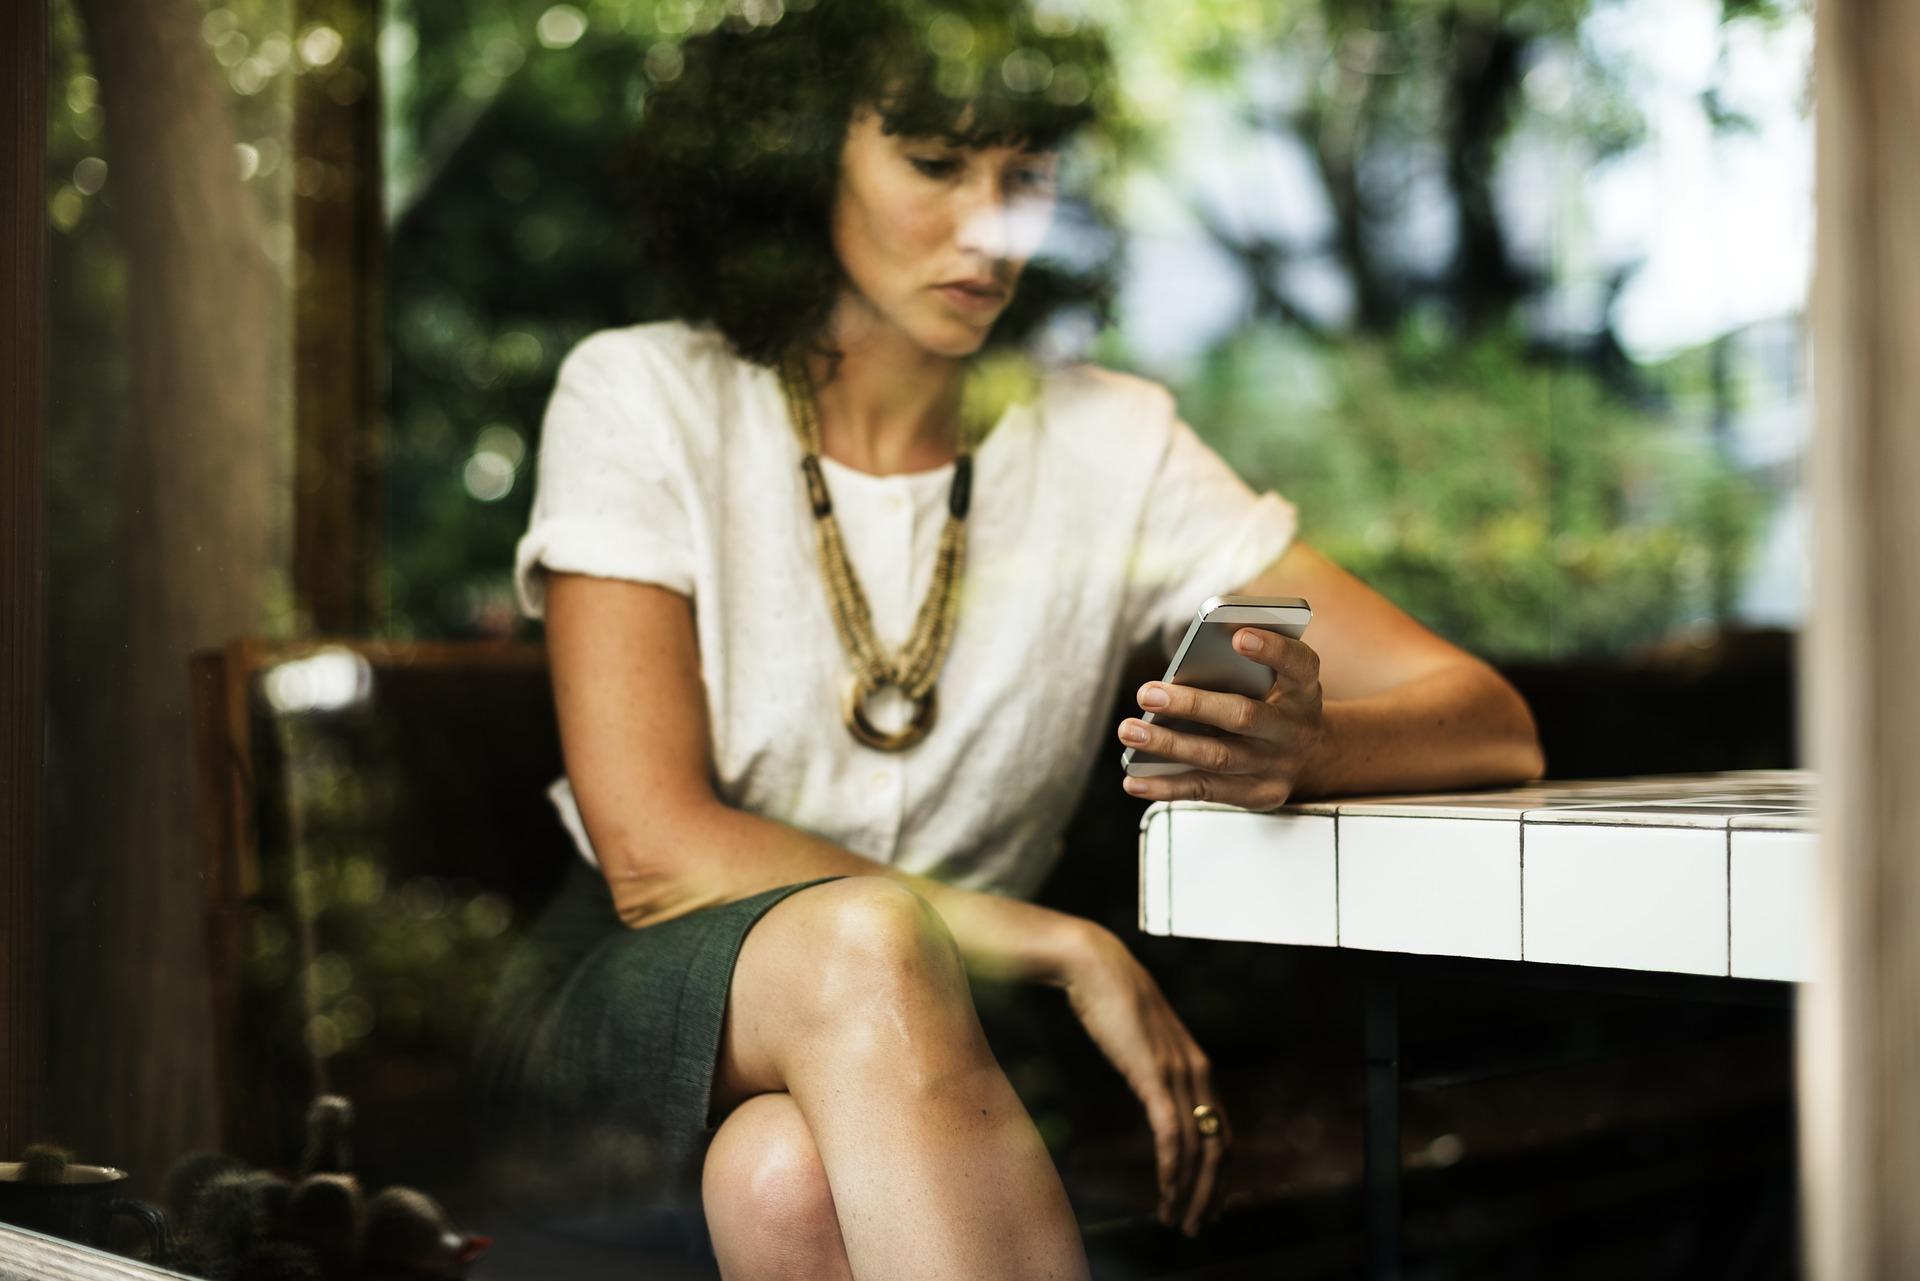 people, woman, phone